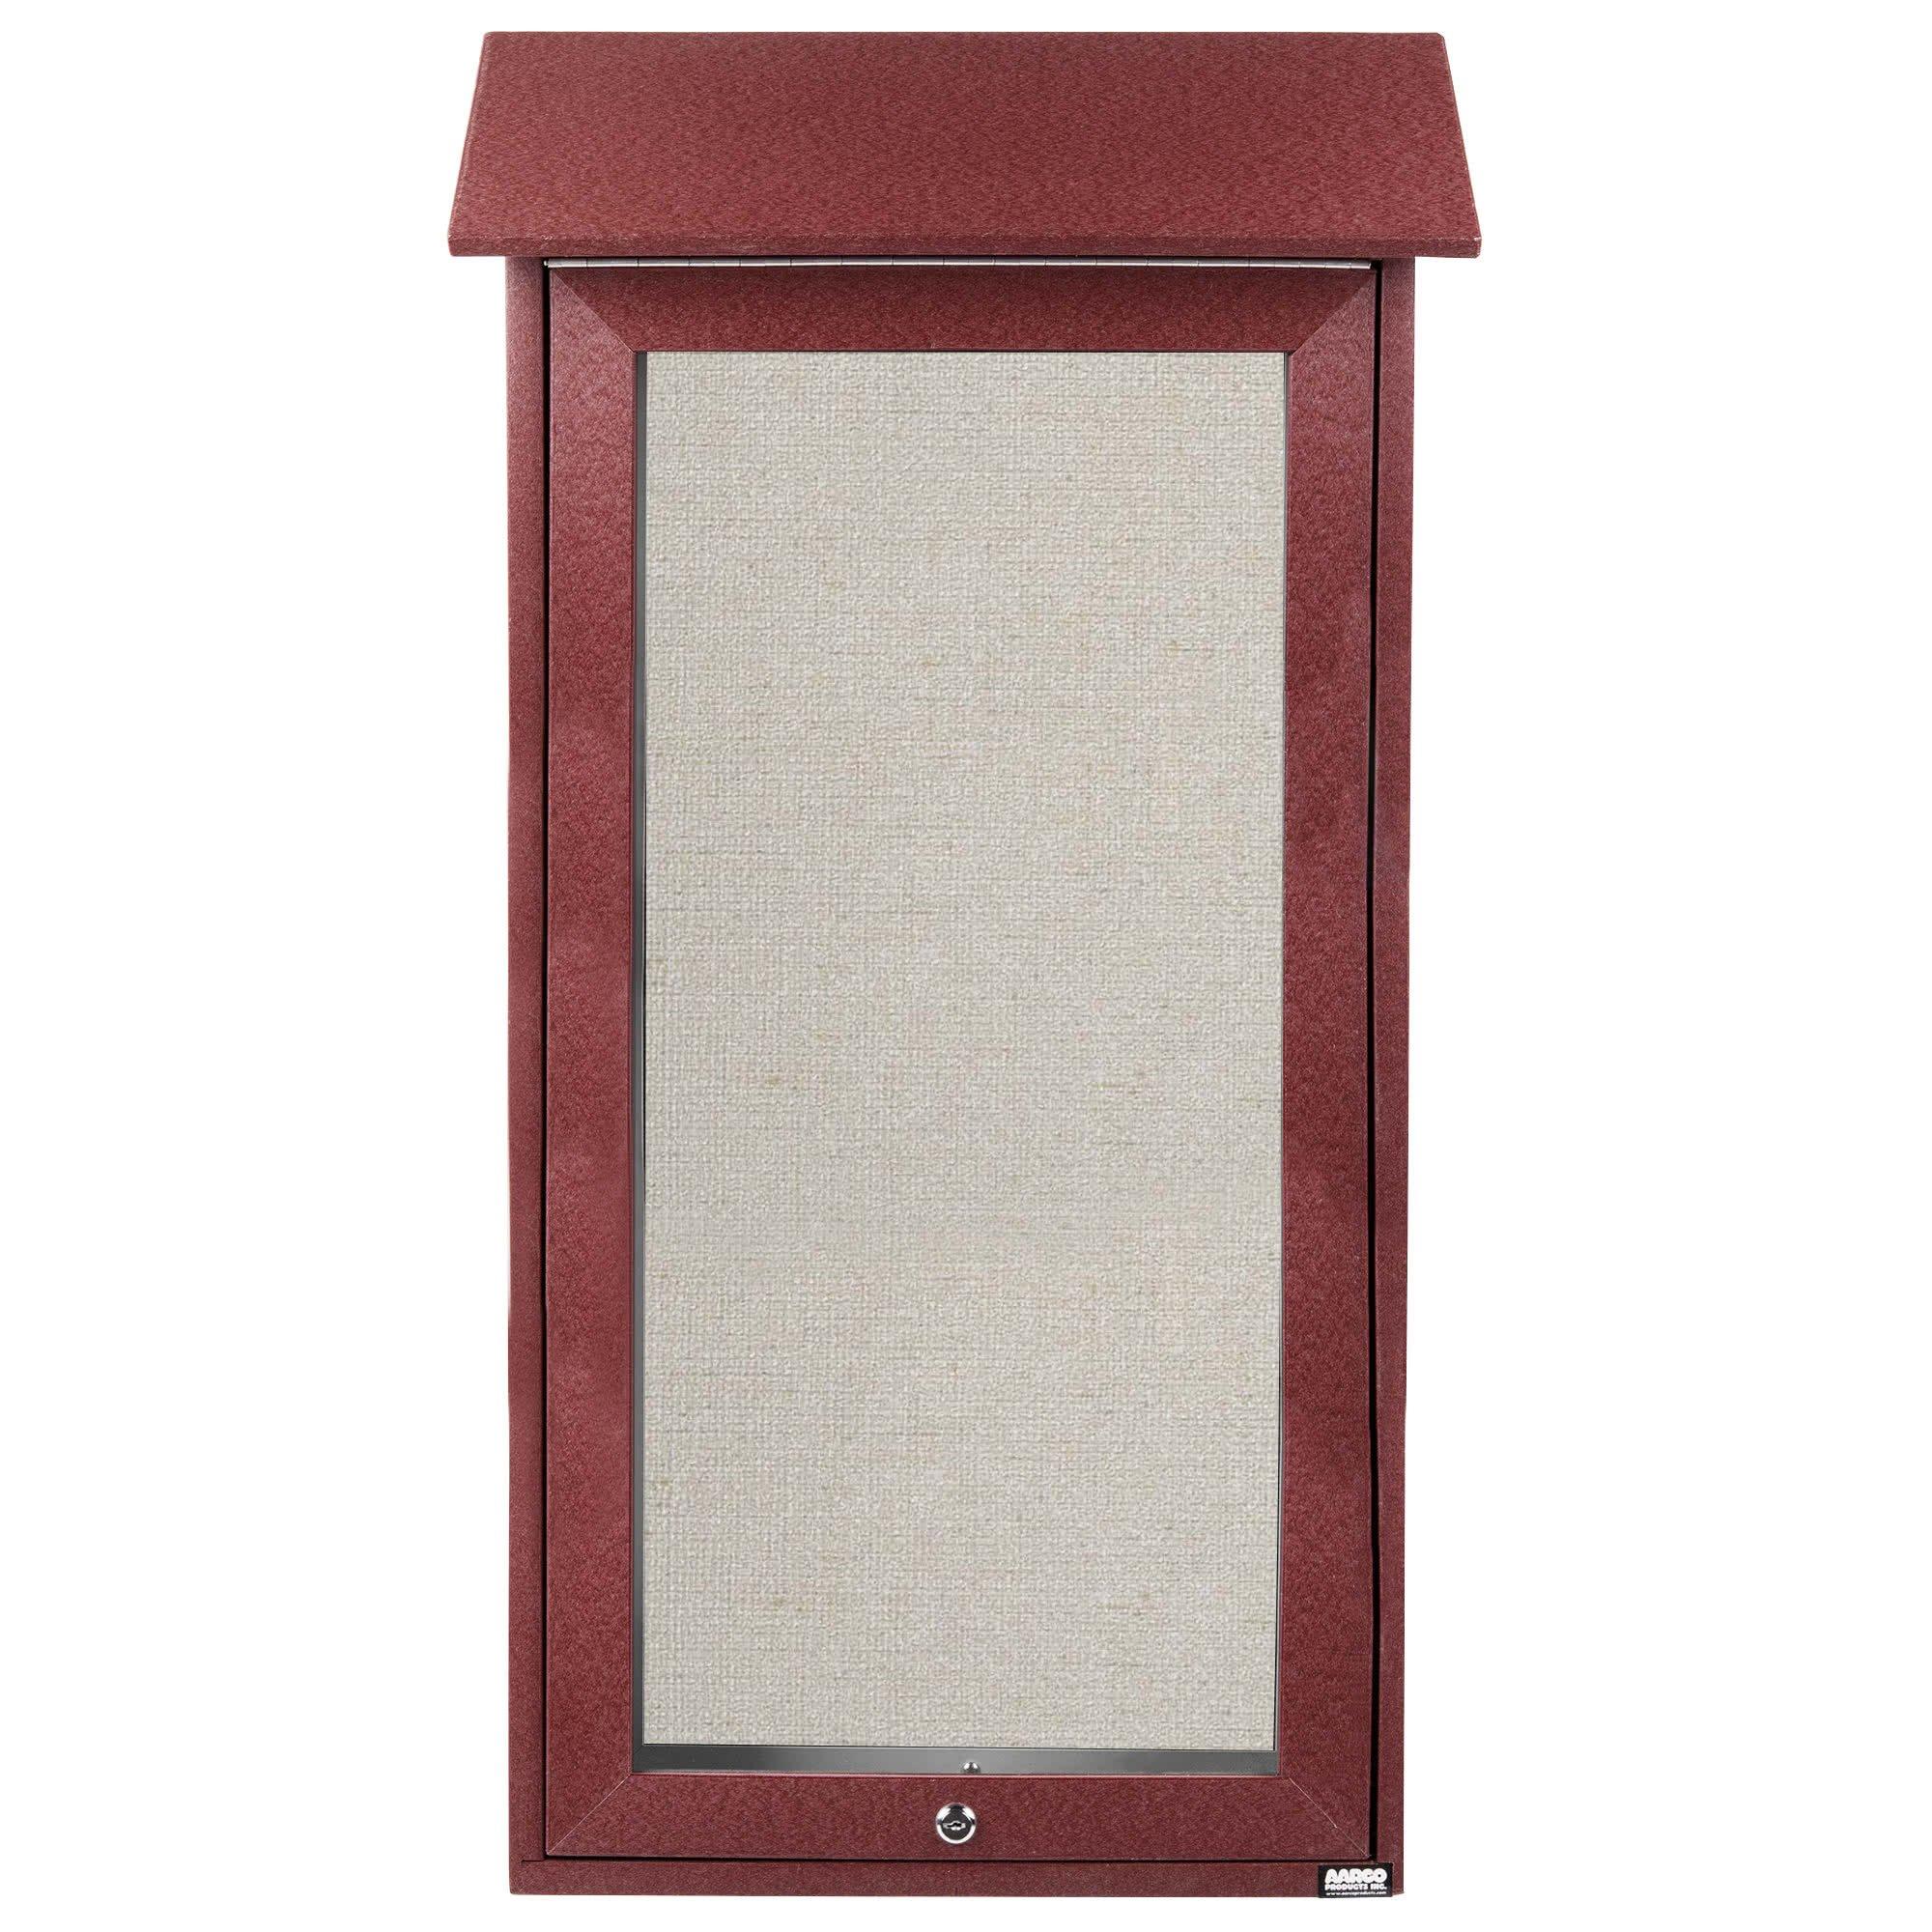 TableTop King OPLD3416-7 Slimline 34'' x 16'' Rosewood Outdoor Plastic Lumber Message Center with Vinyl Board - Single Top Hinged Door